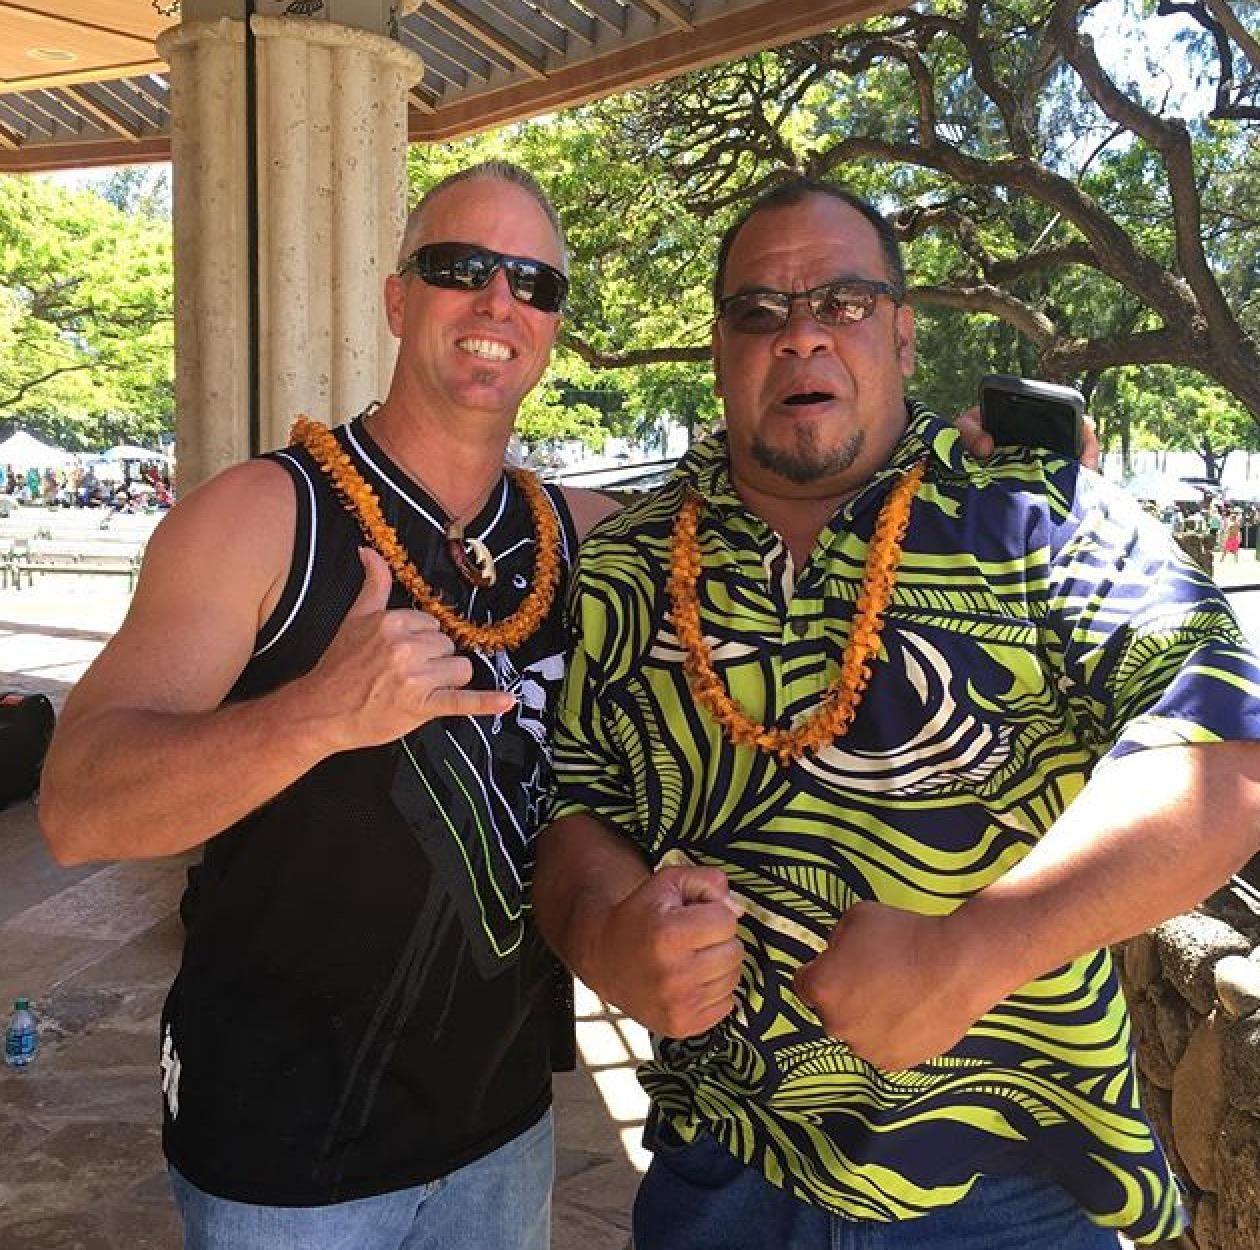 King Kamehameha Celebration with Bobby and Kahi (2/3) of Maunalua...where's Richard?